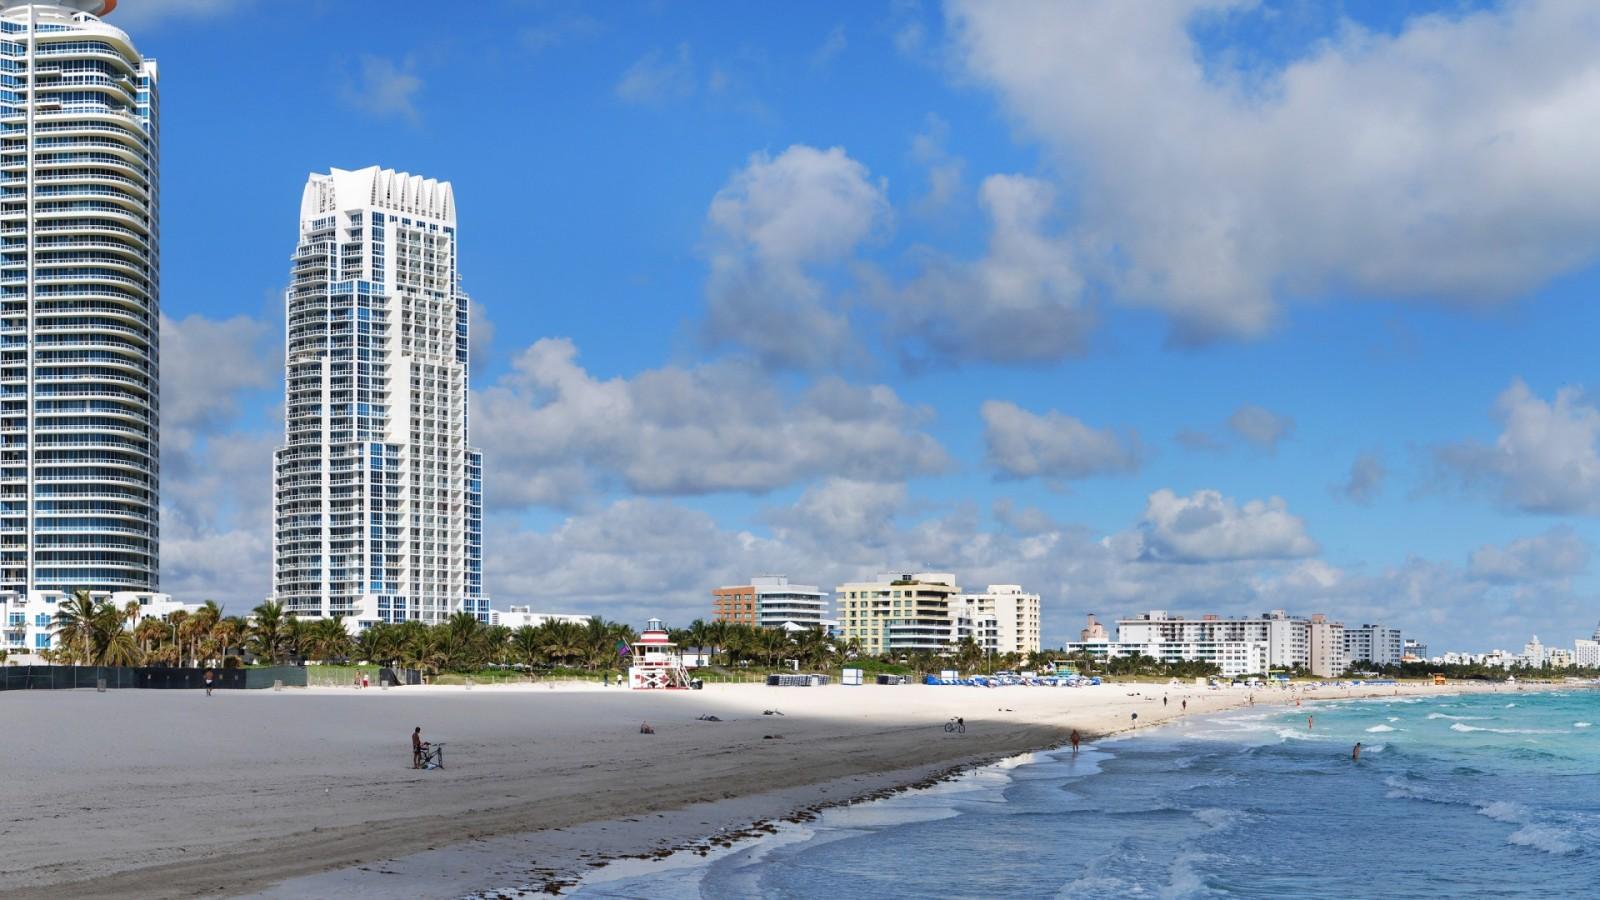 Miami South Beach Florida Pictures HD Wallpaper Miami South Beach 1600x900